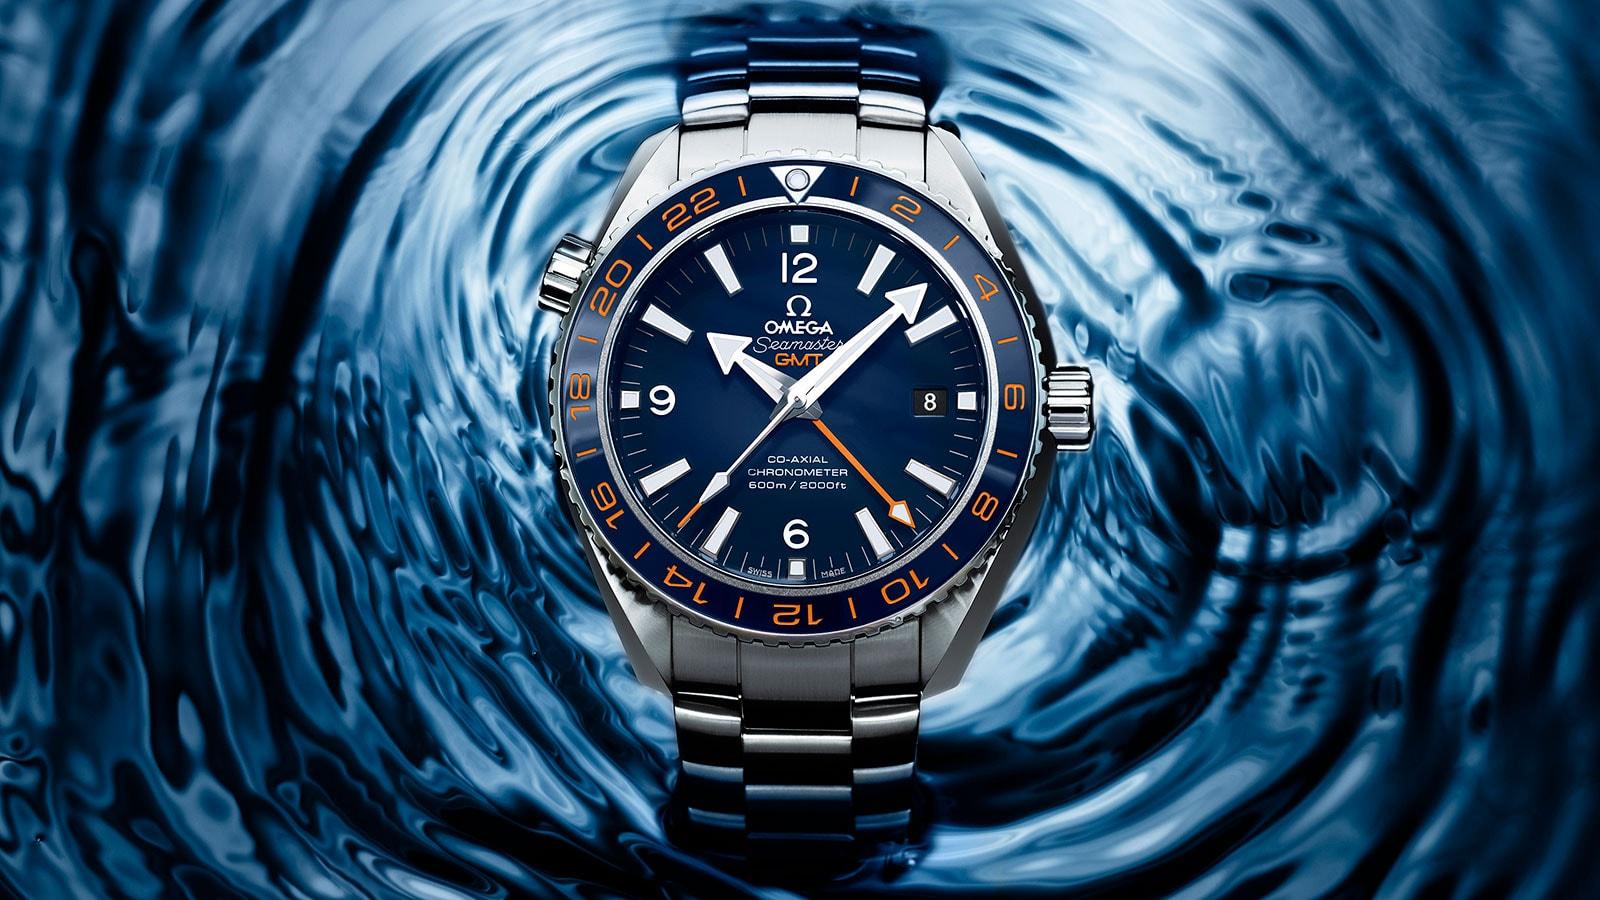 Seamaster 海洋宇宙600米腕表 海洋宇宙600米 欧米茄43.5毫米同轴GMT腕表 腕表 - 232.30.44.22.03.001